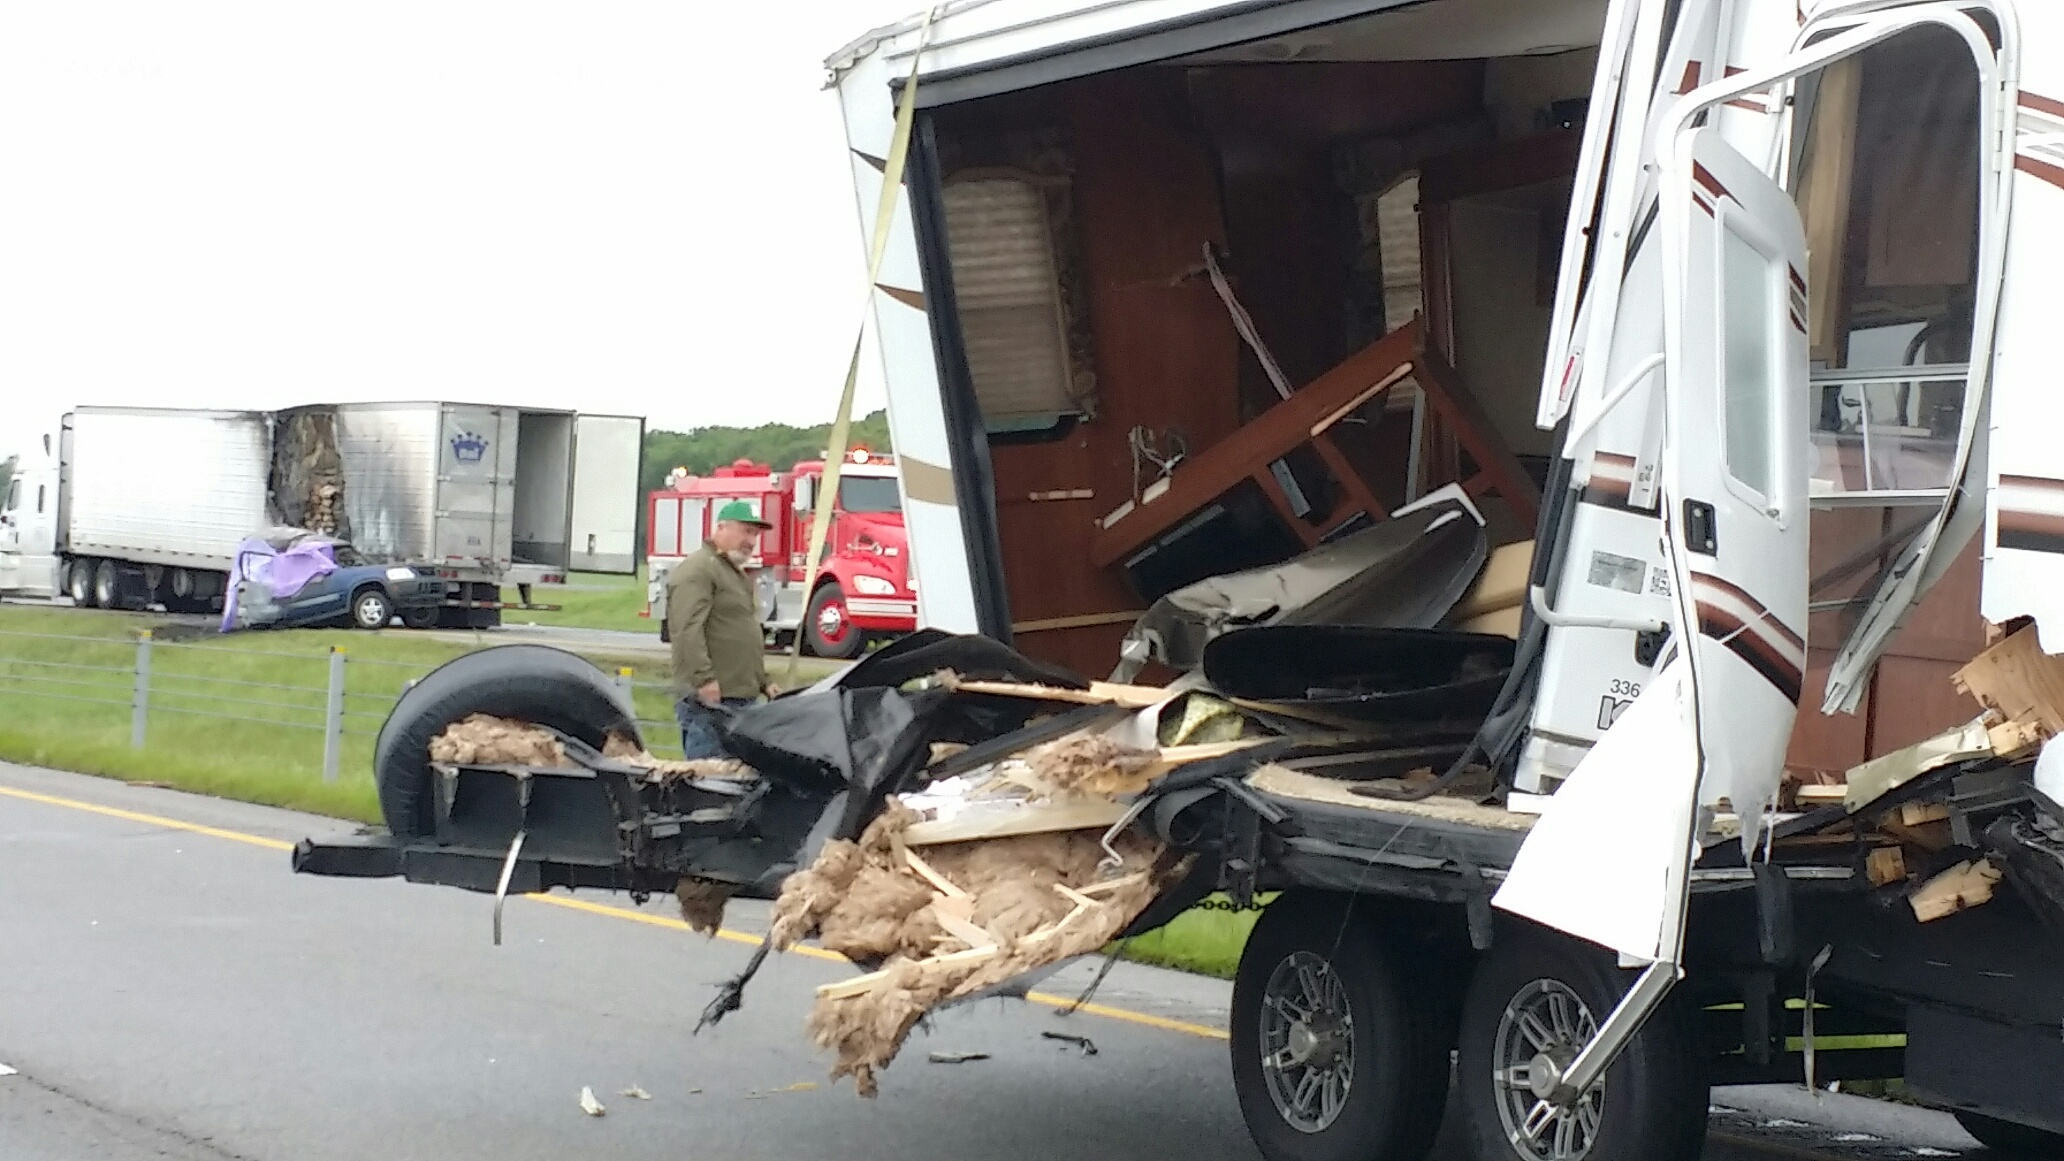 I-40 westbound lanes reopened hours after fatal crash